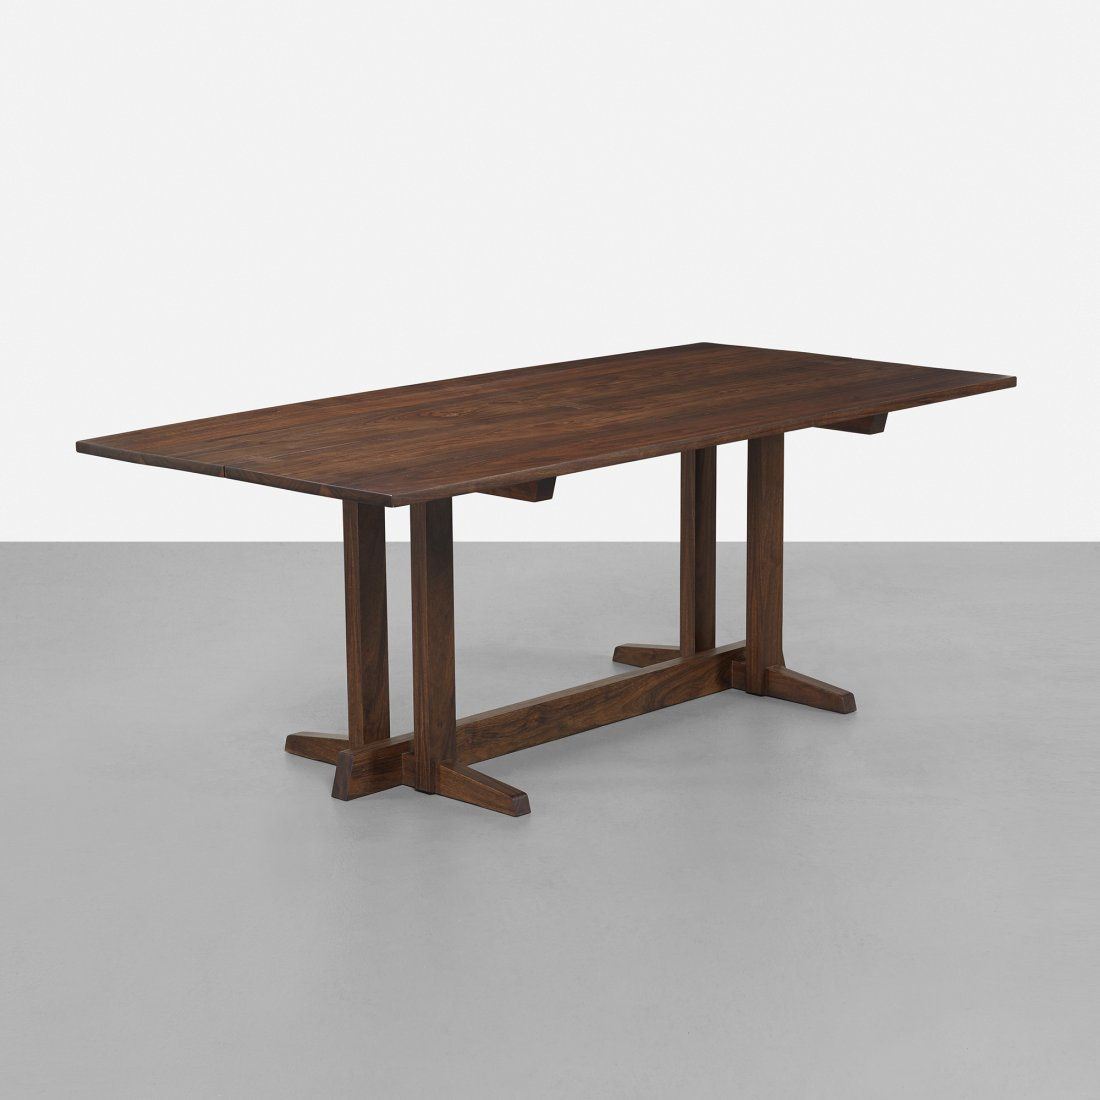 George Nakashima Frenchman's Cove II dining table